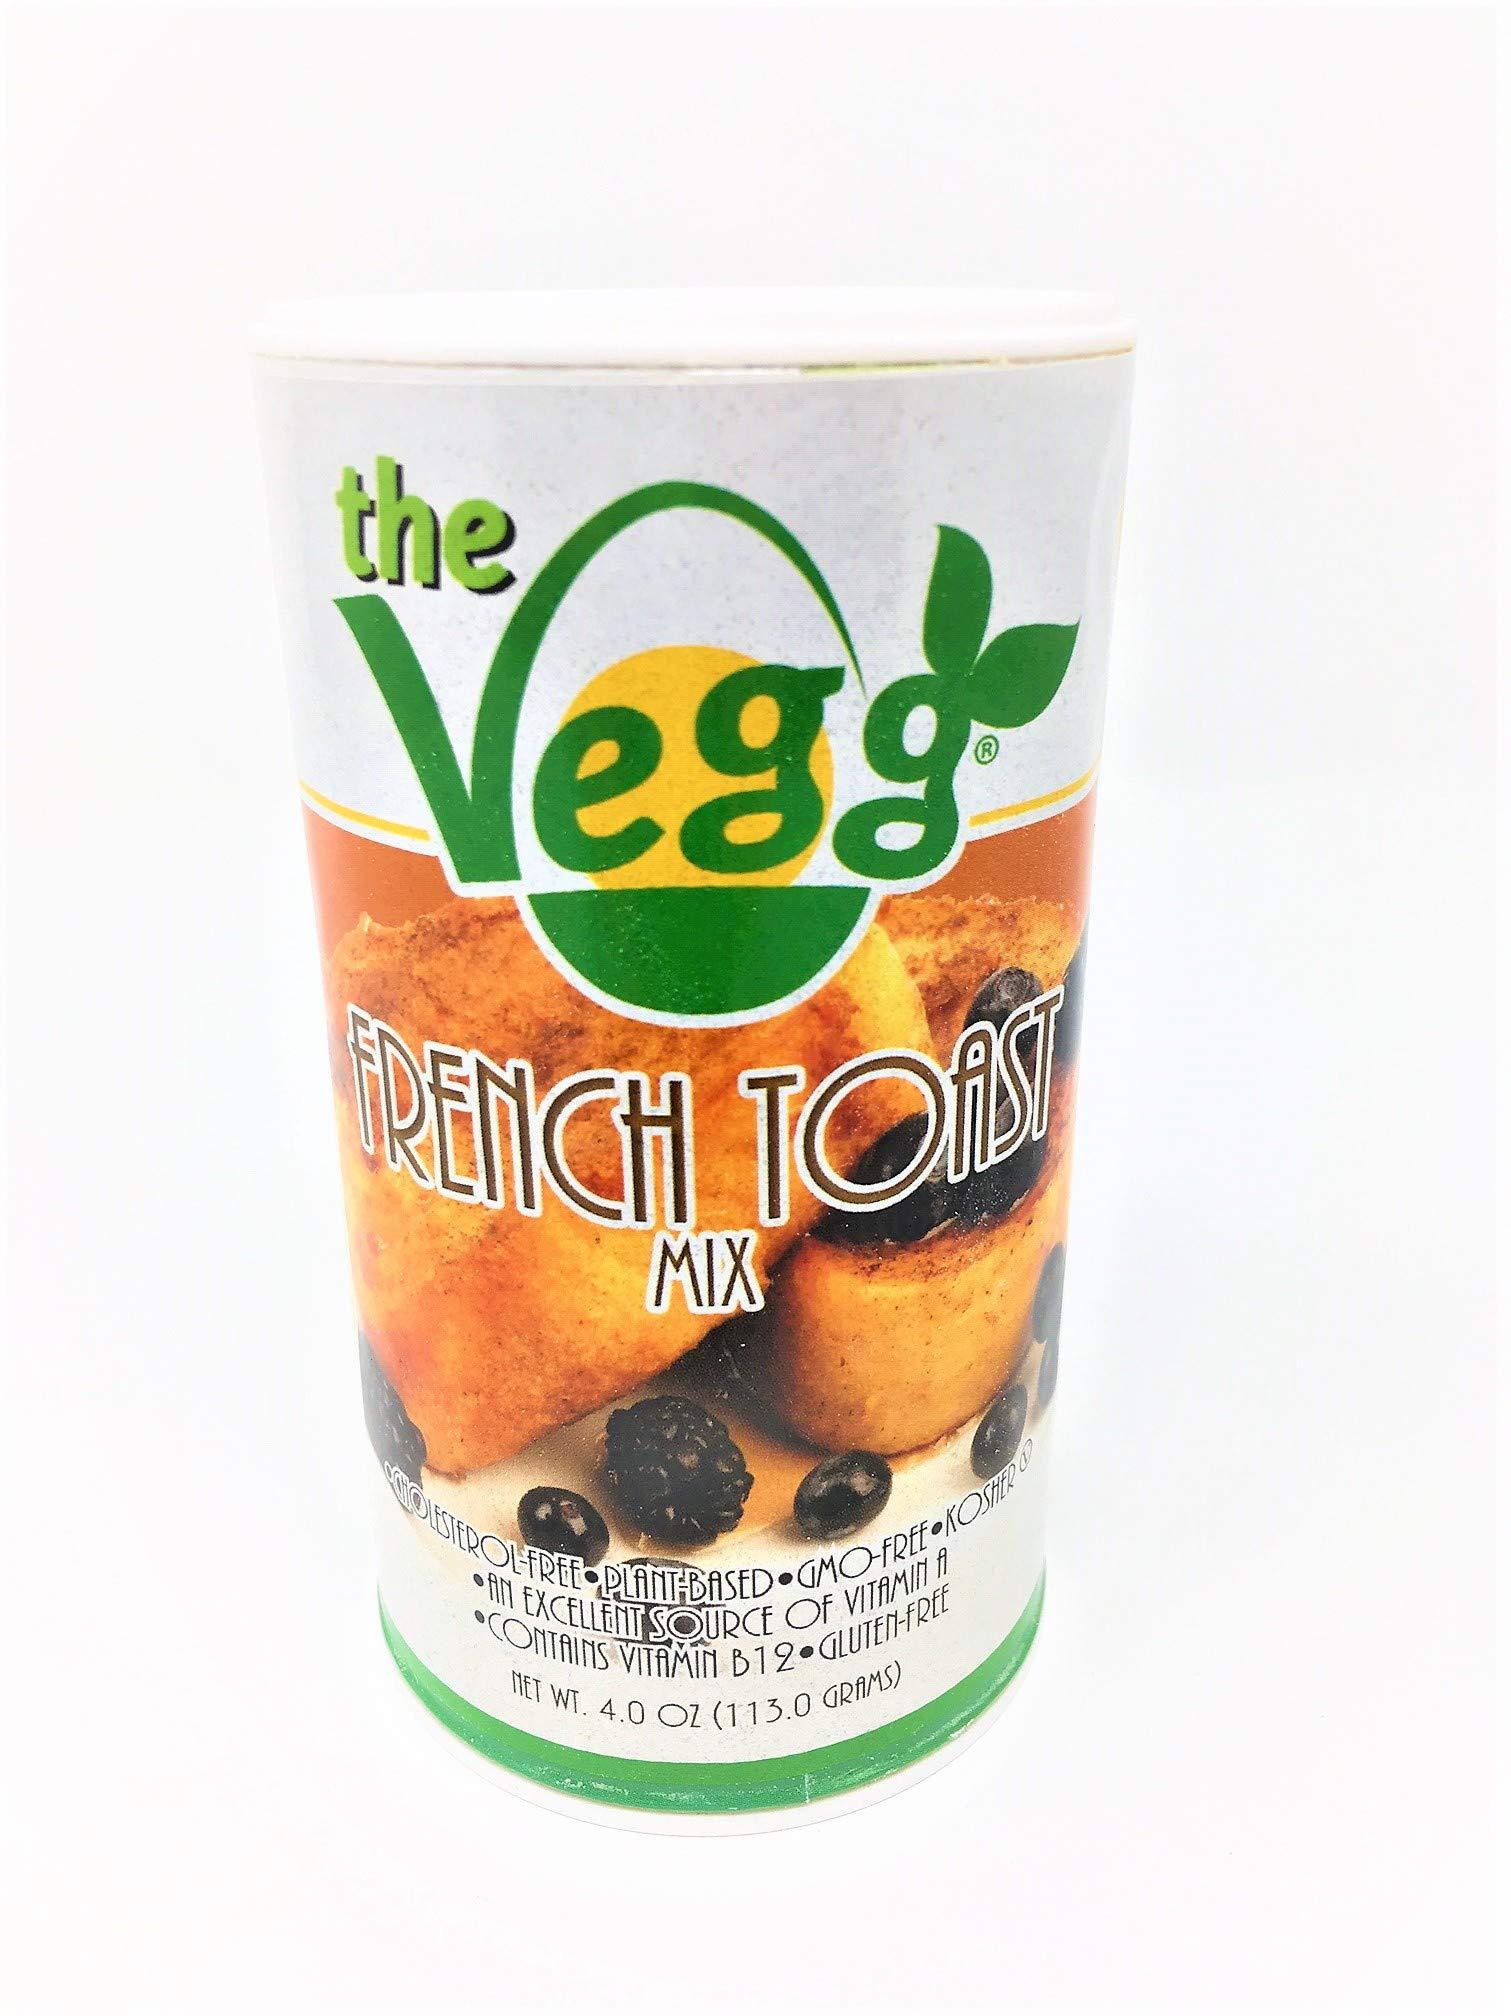 The Vegg Vegan Mega Pack Vegan Egg Yolk + Power Scramble + French Toast Mix + Uncaged Baking Mix + Egg Wisk + Measuring Cups and Spoons + The Vegg Cookbook by The Vegg (Image #4)